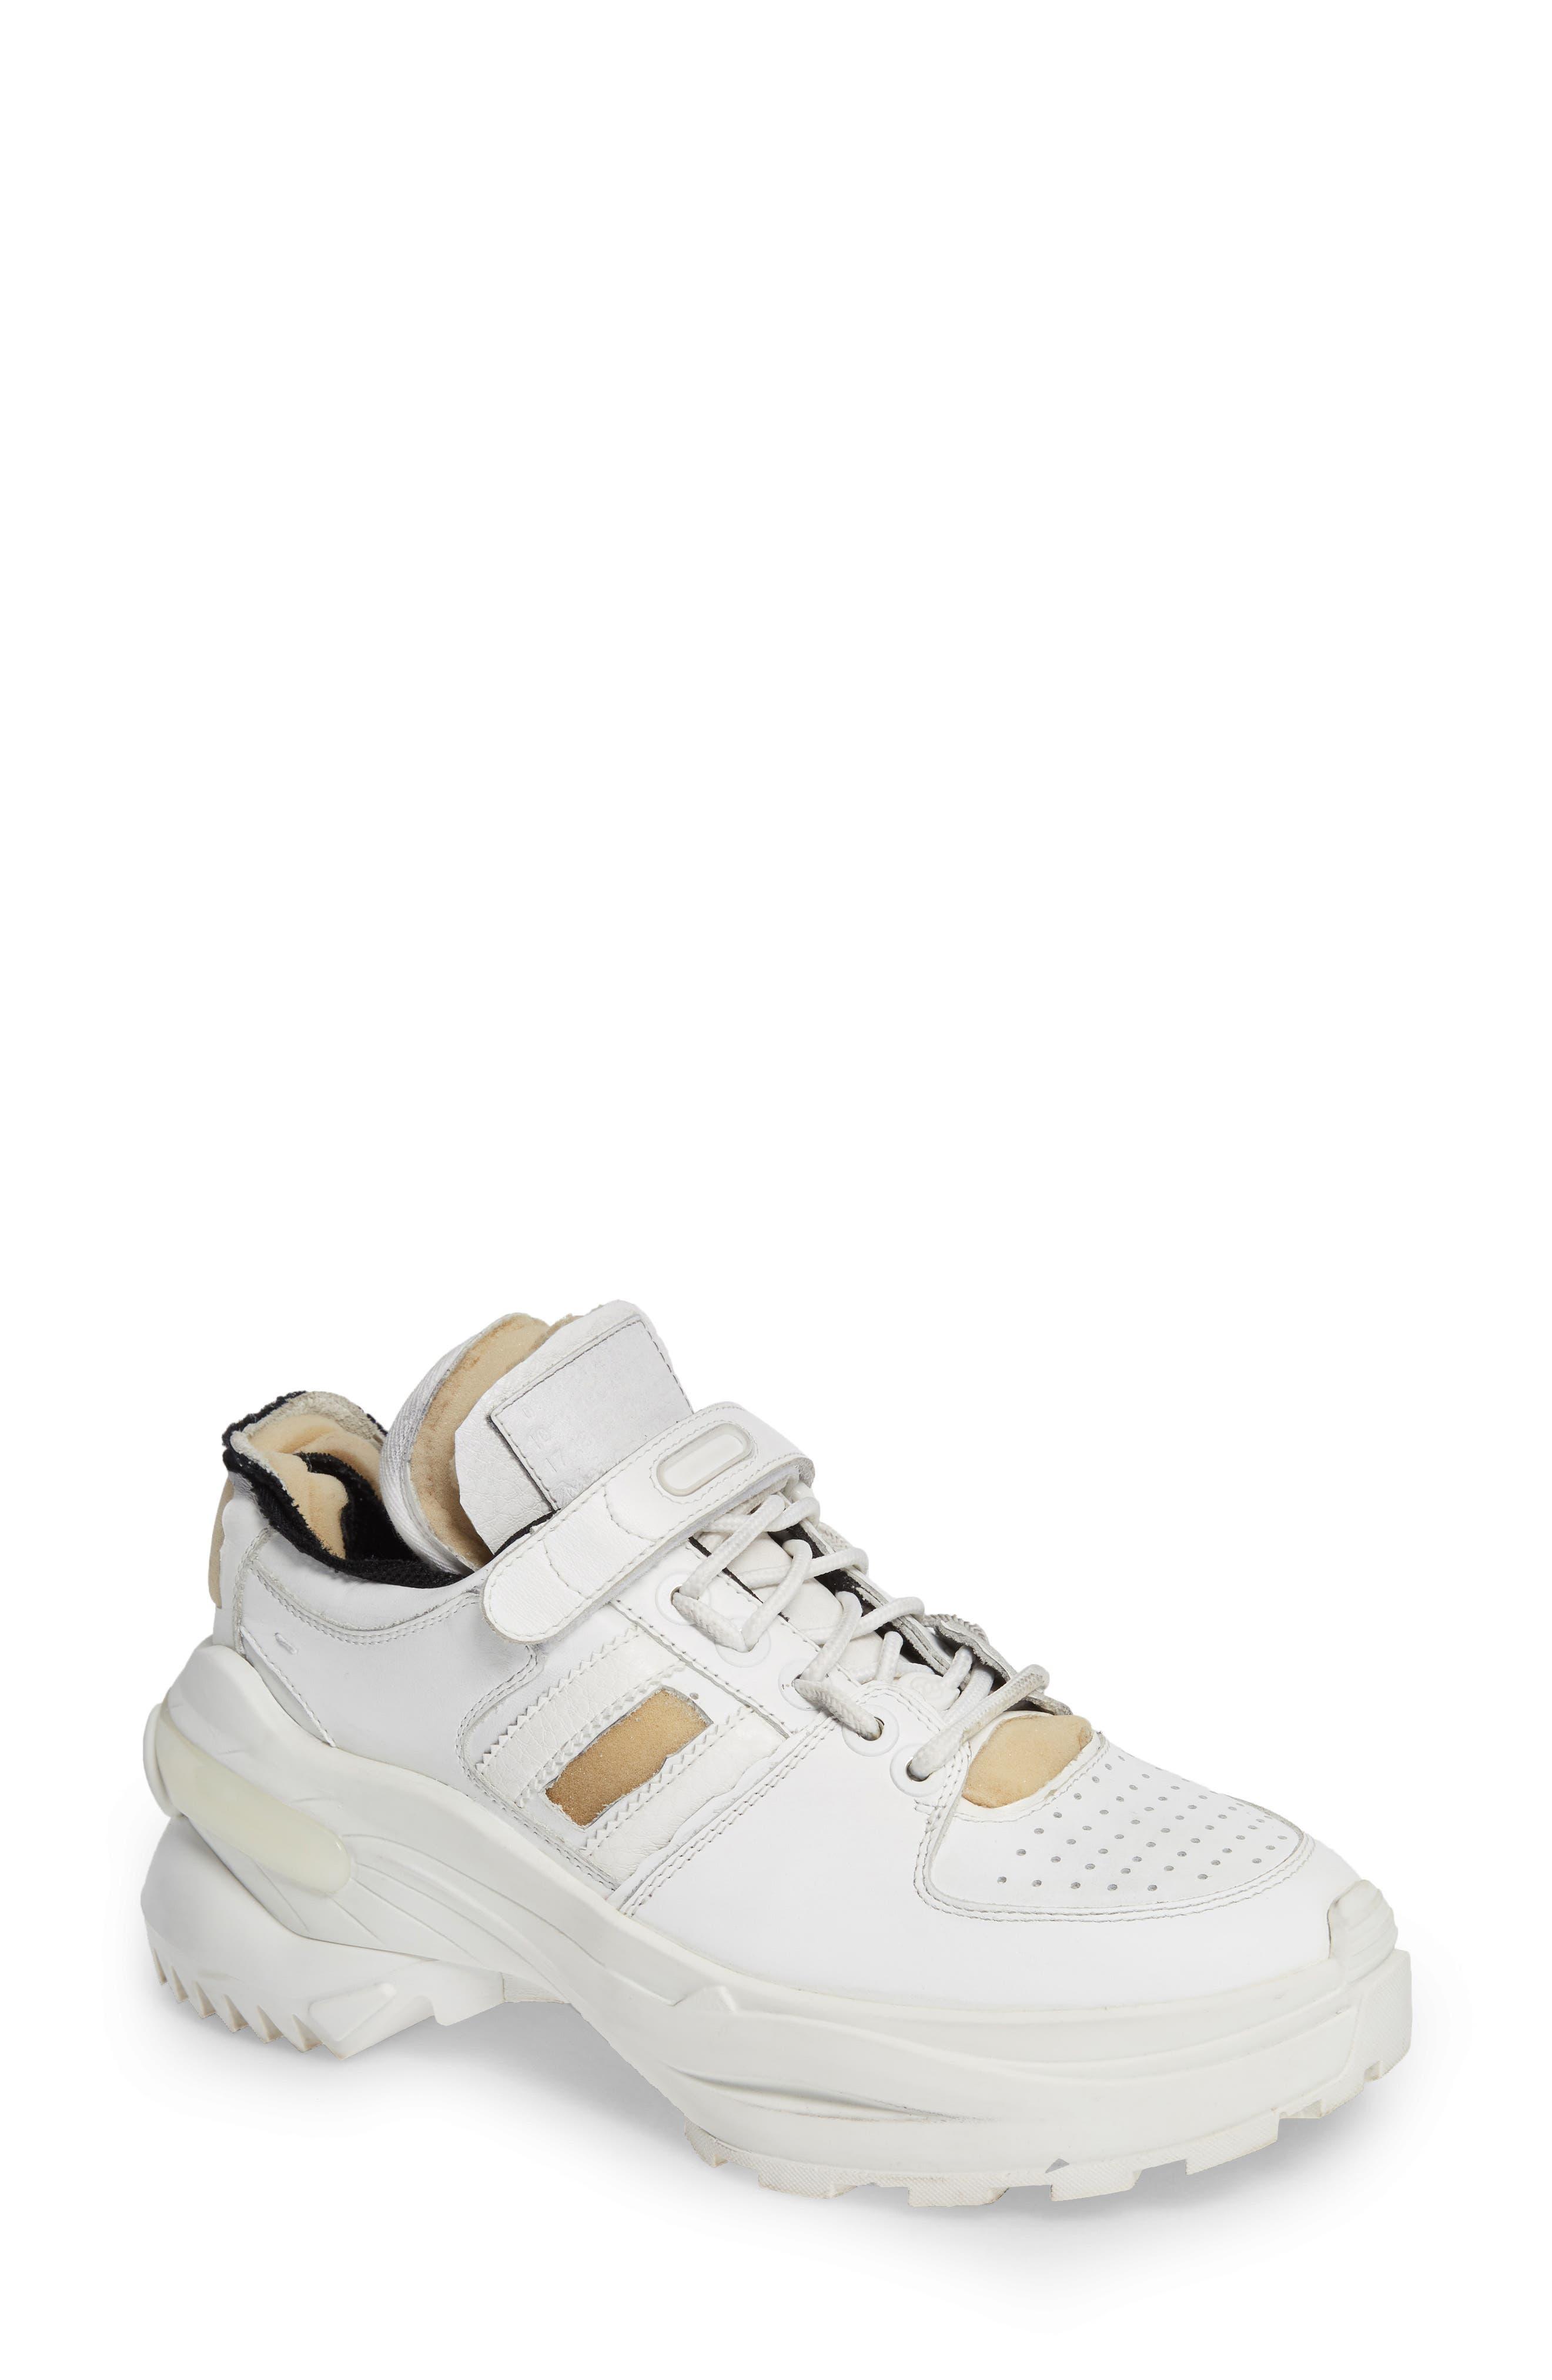 MAISON MARGIELA Retro Fit Destroyed Sneaker, Main, color, WHITE